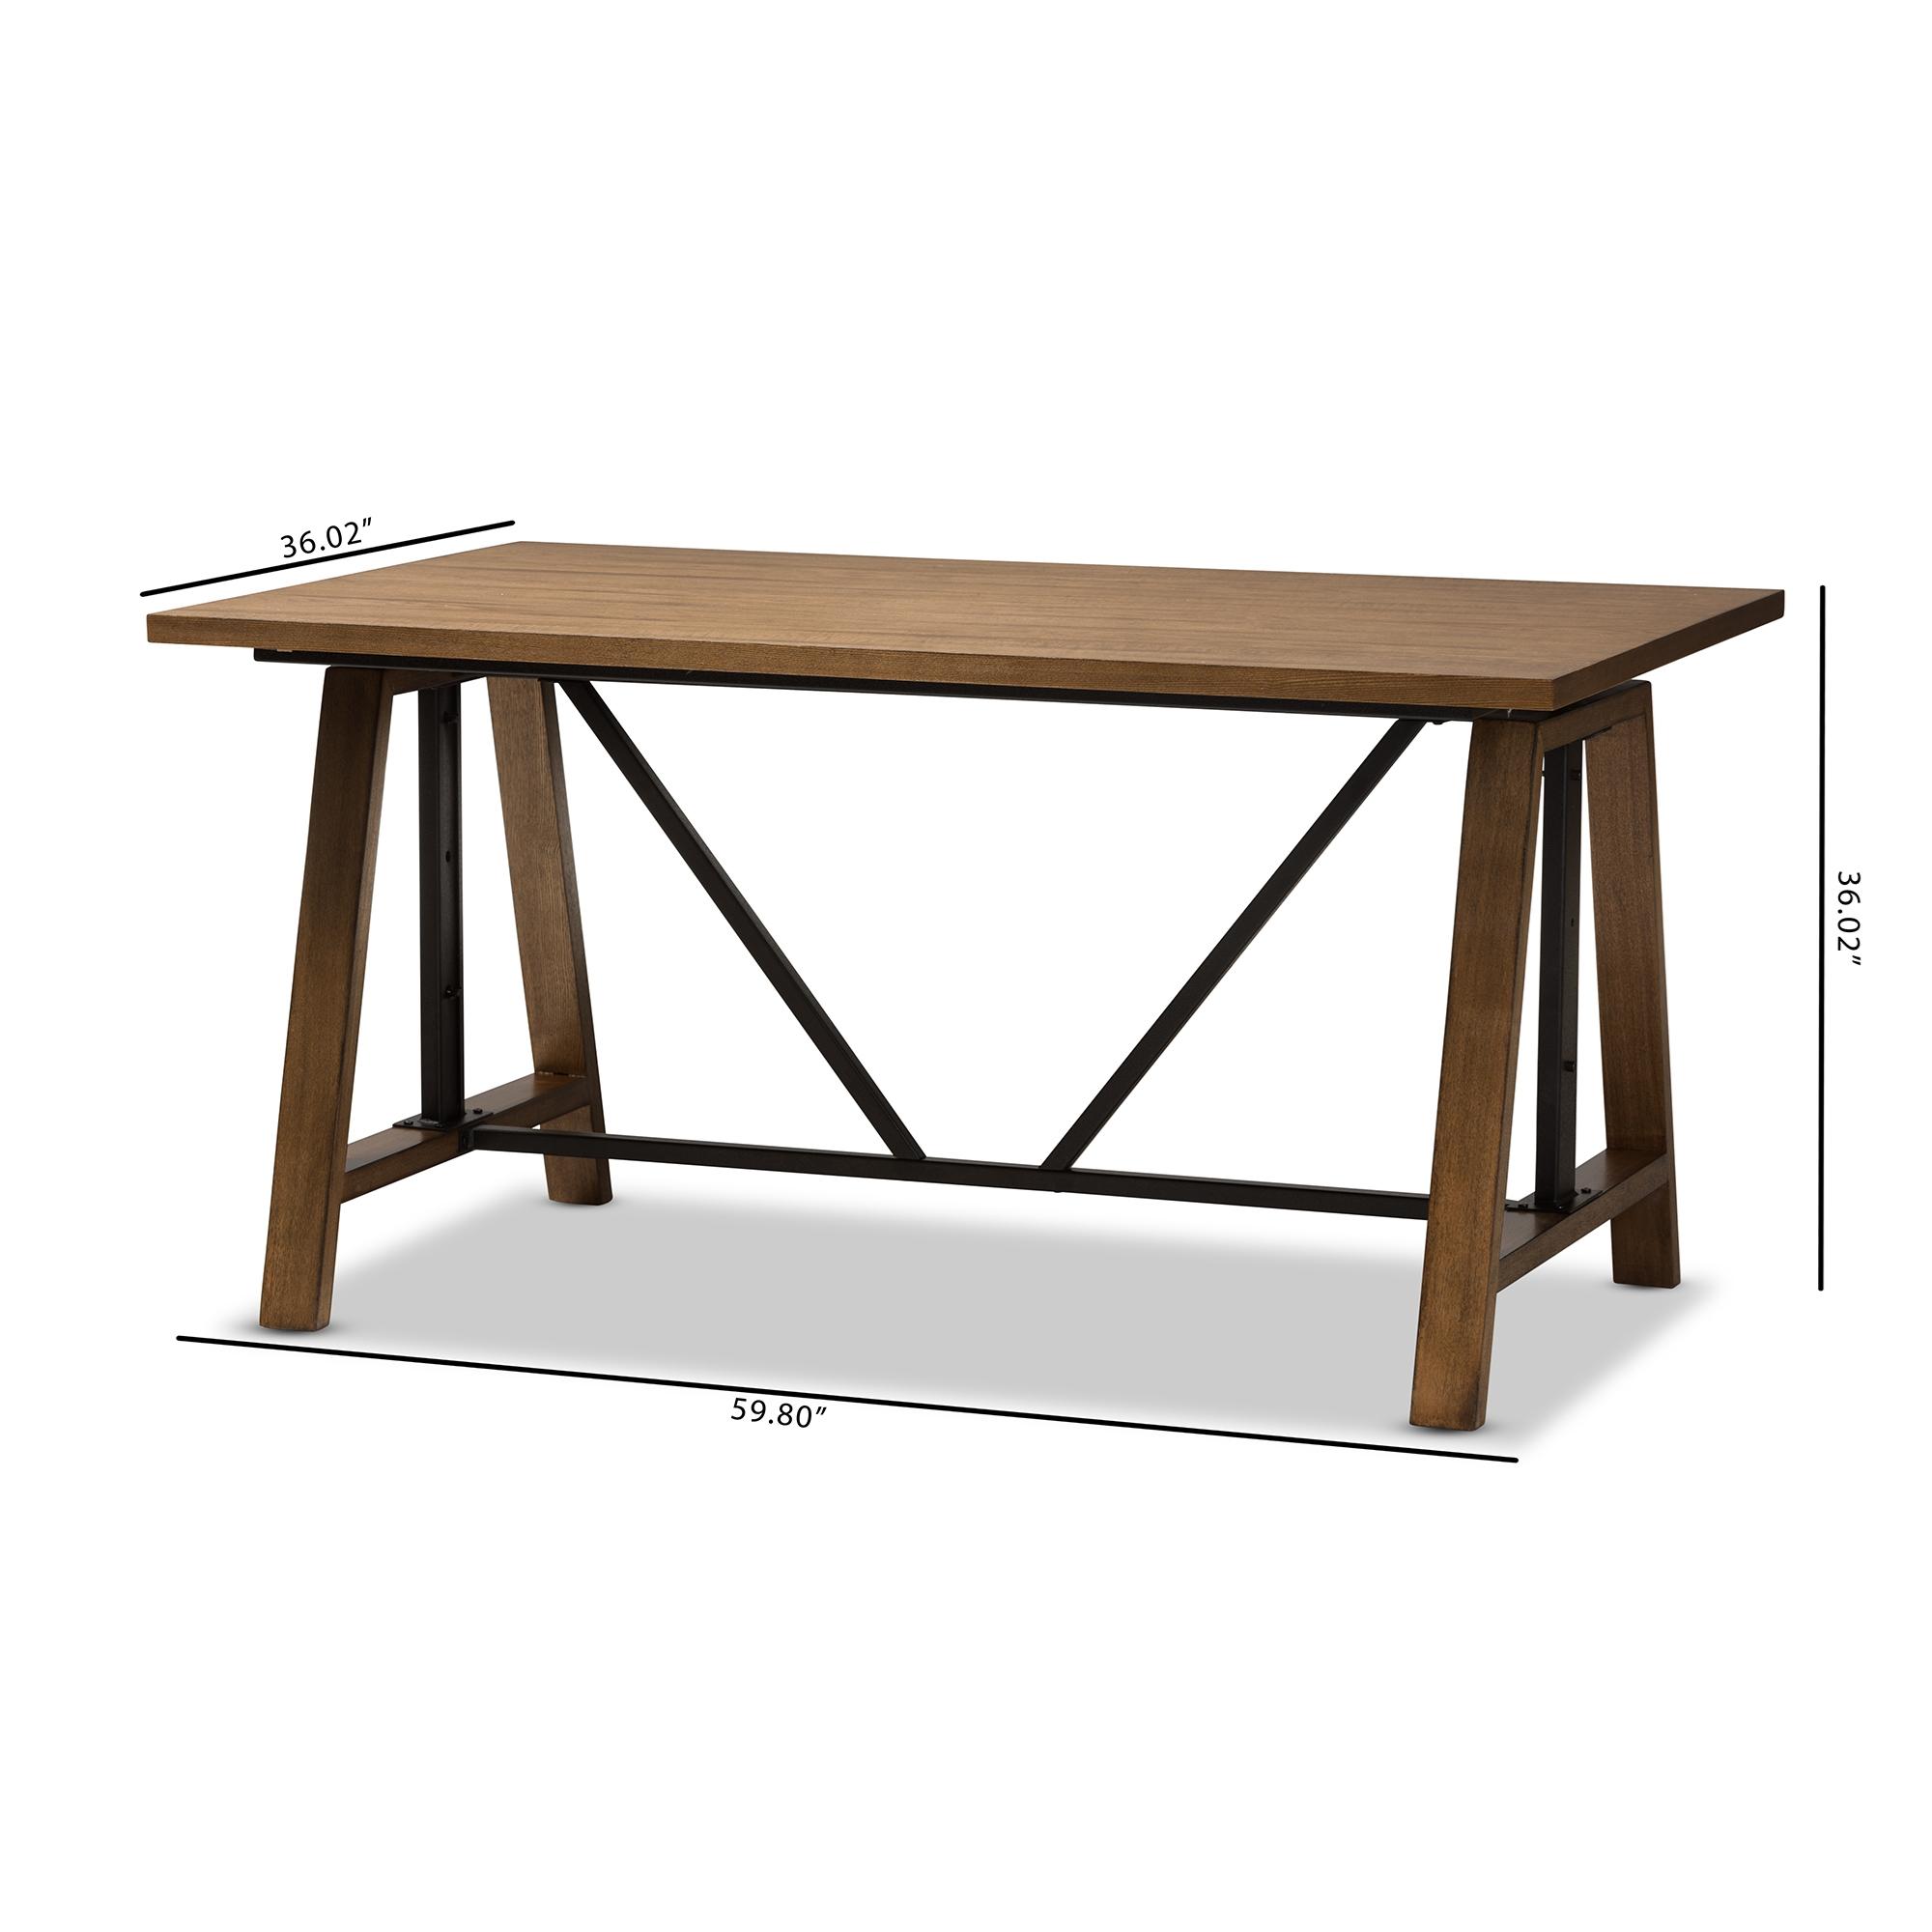 ... Baxton Studio Nico Rustic Industrial Metal And Distressed Wood  Adjustable Height Work Table   BSOYLX